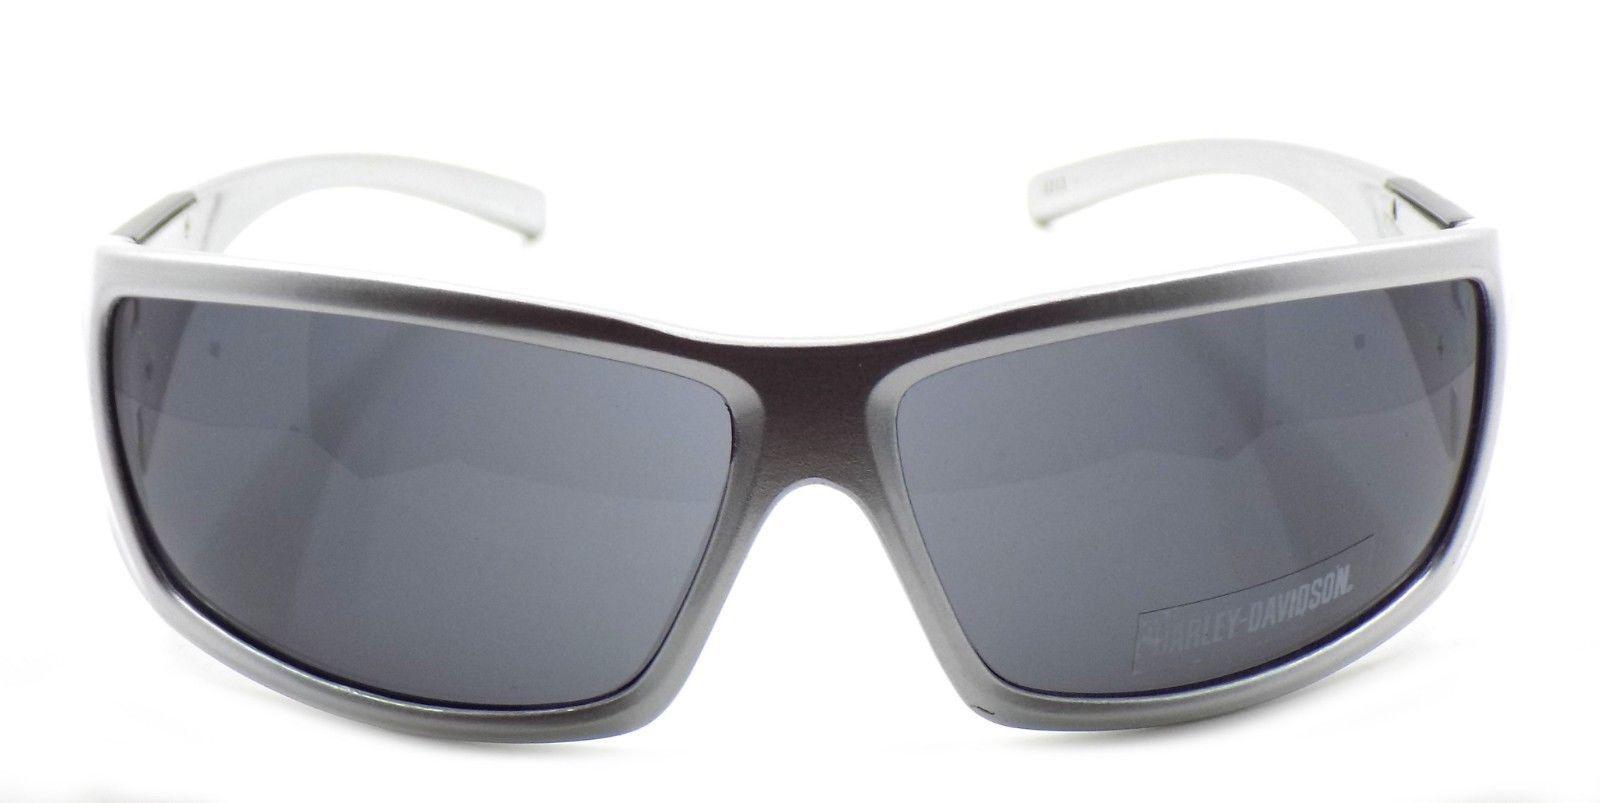 Harley Davidson HDX872 SI-3 Wraparound Sunglasses Silver 67-14-130 Smoke + CASE